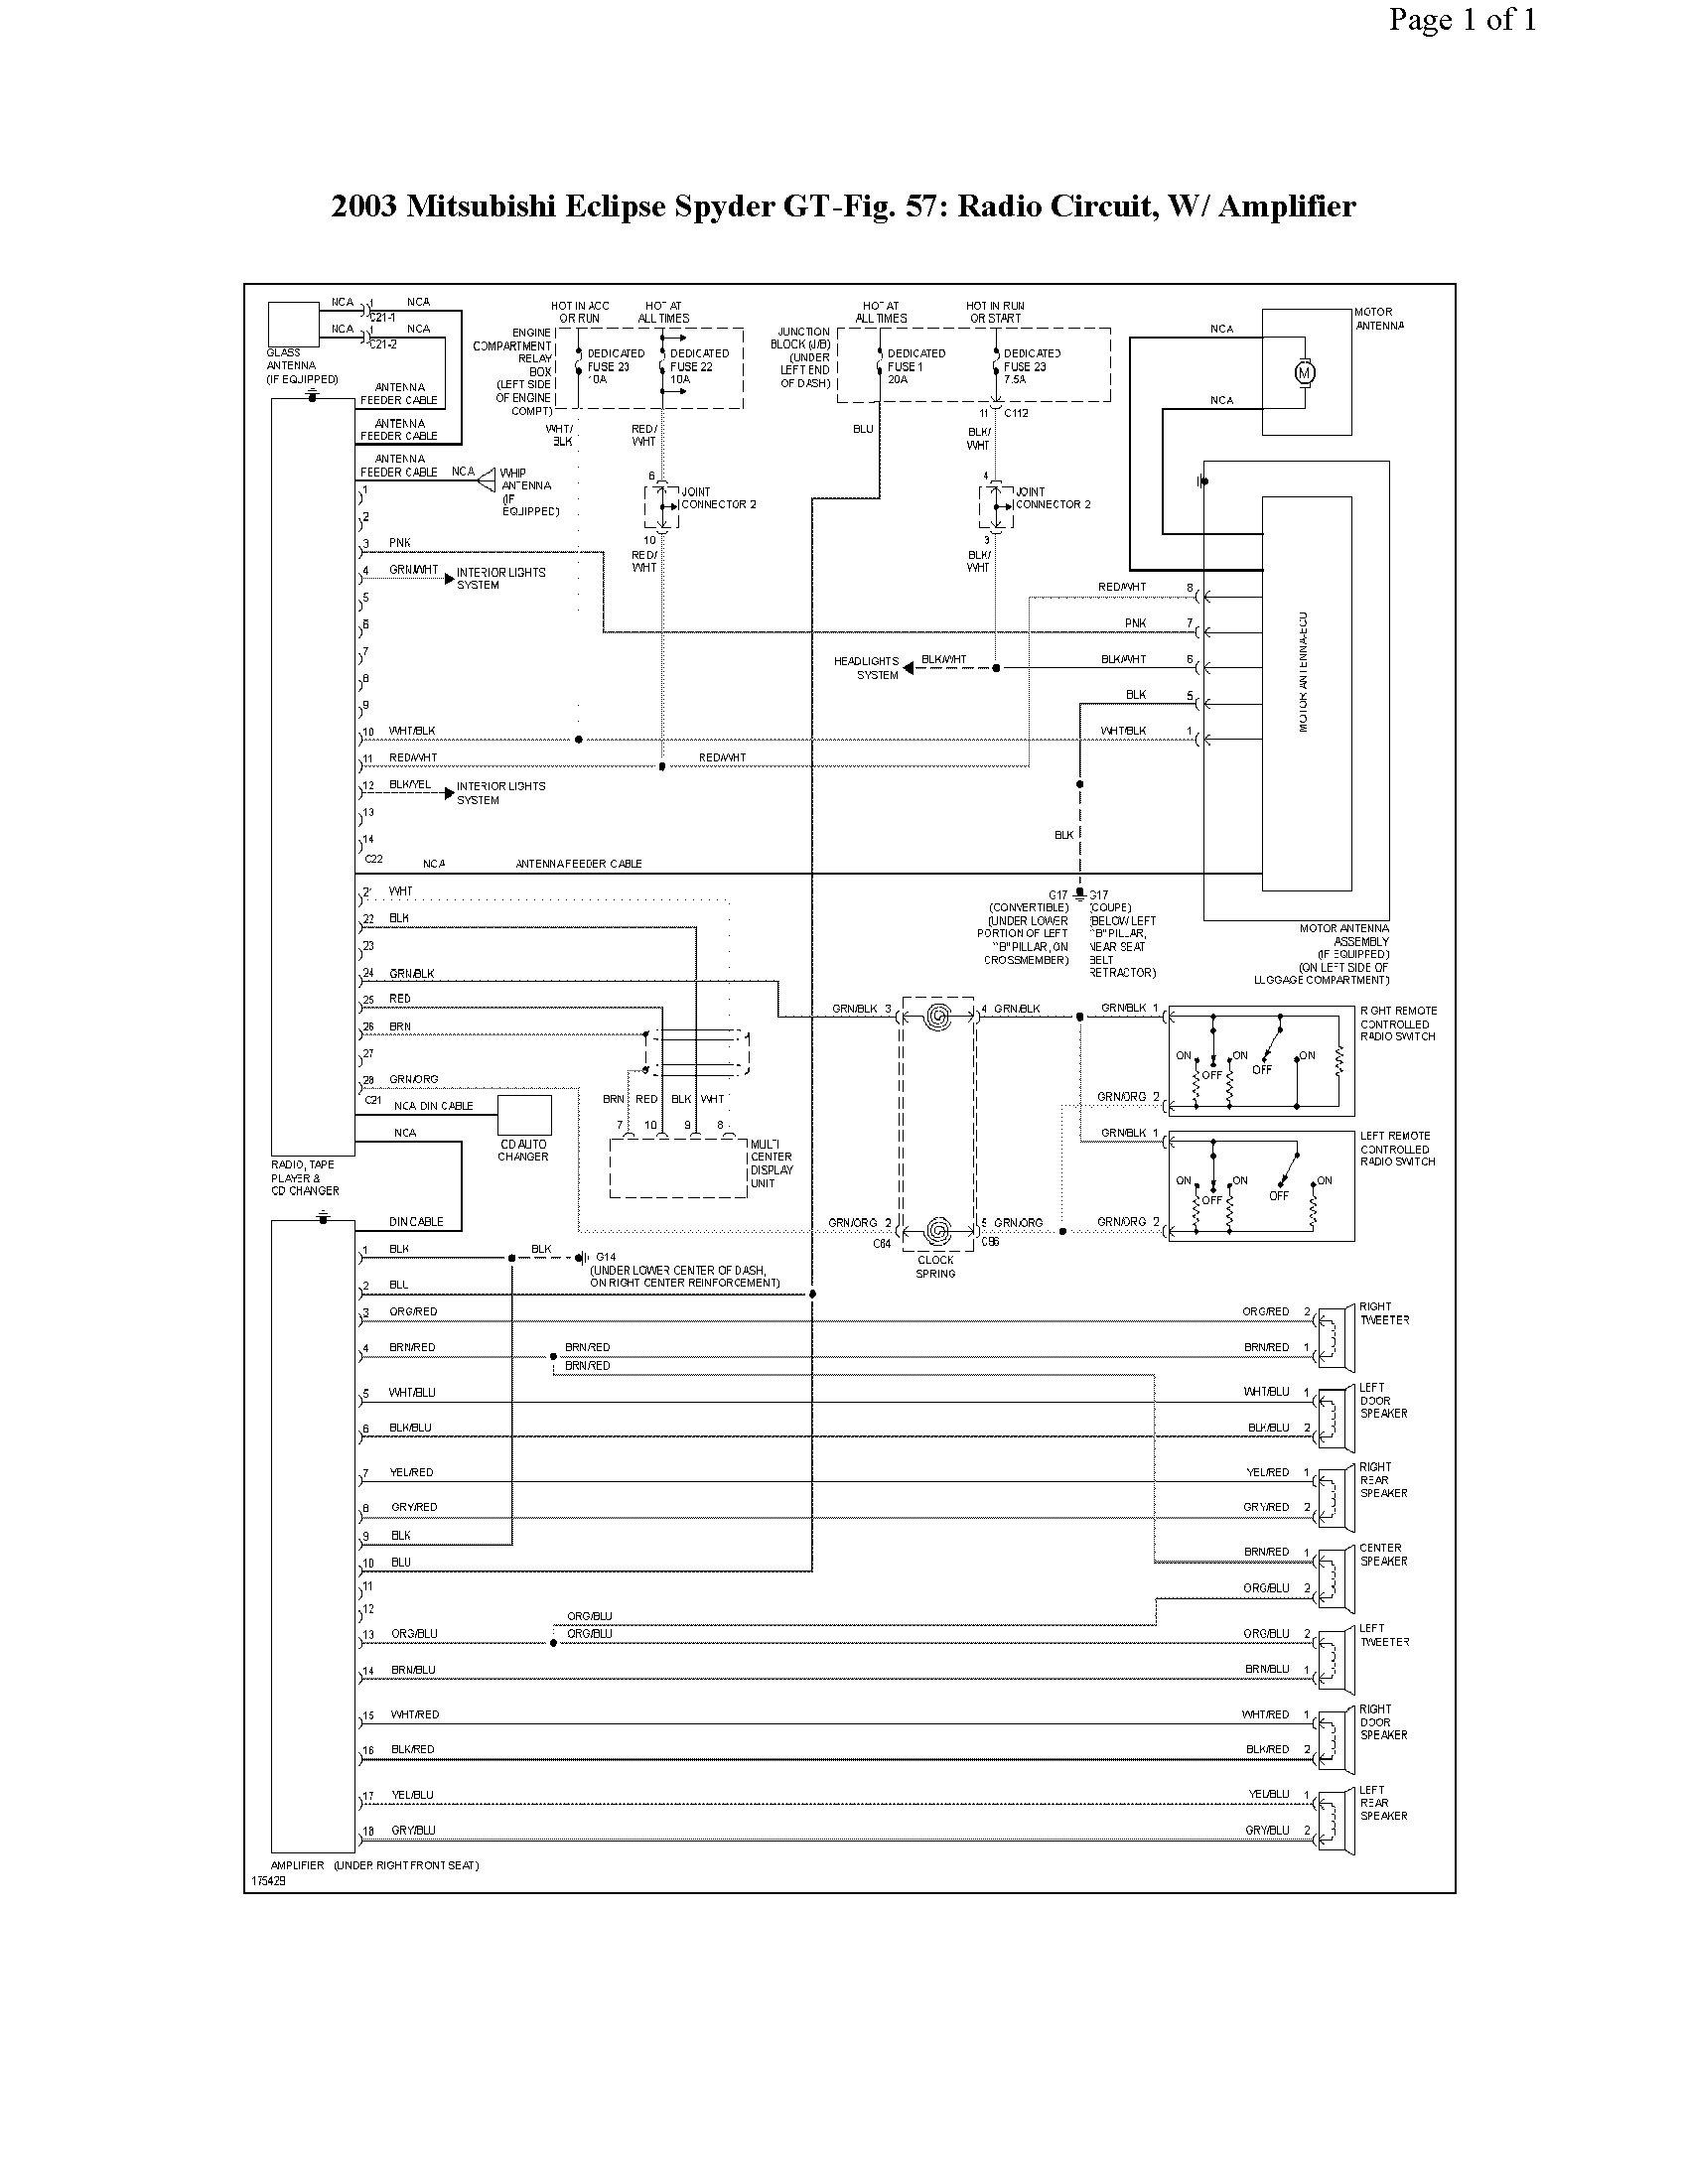 1990 eagle talon wiring diagram 2g dsm wiring diagram wiring diagram data  2g dsm wiring diagram wiring diagram data